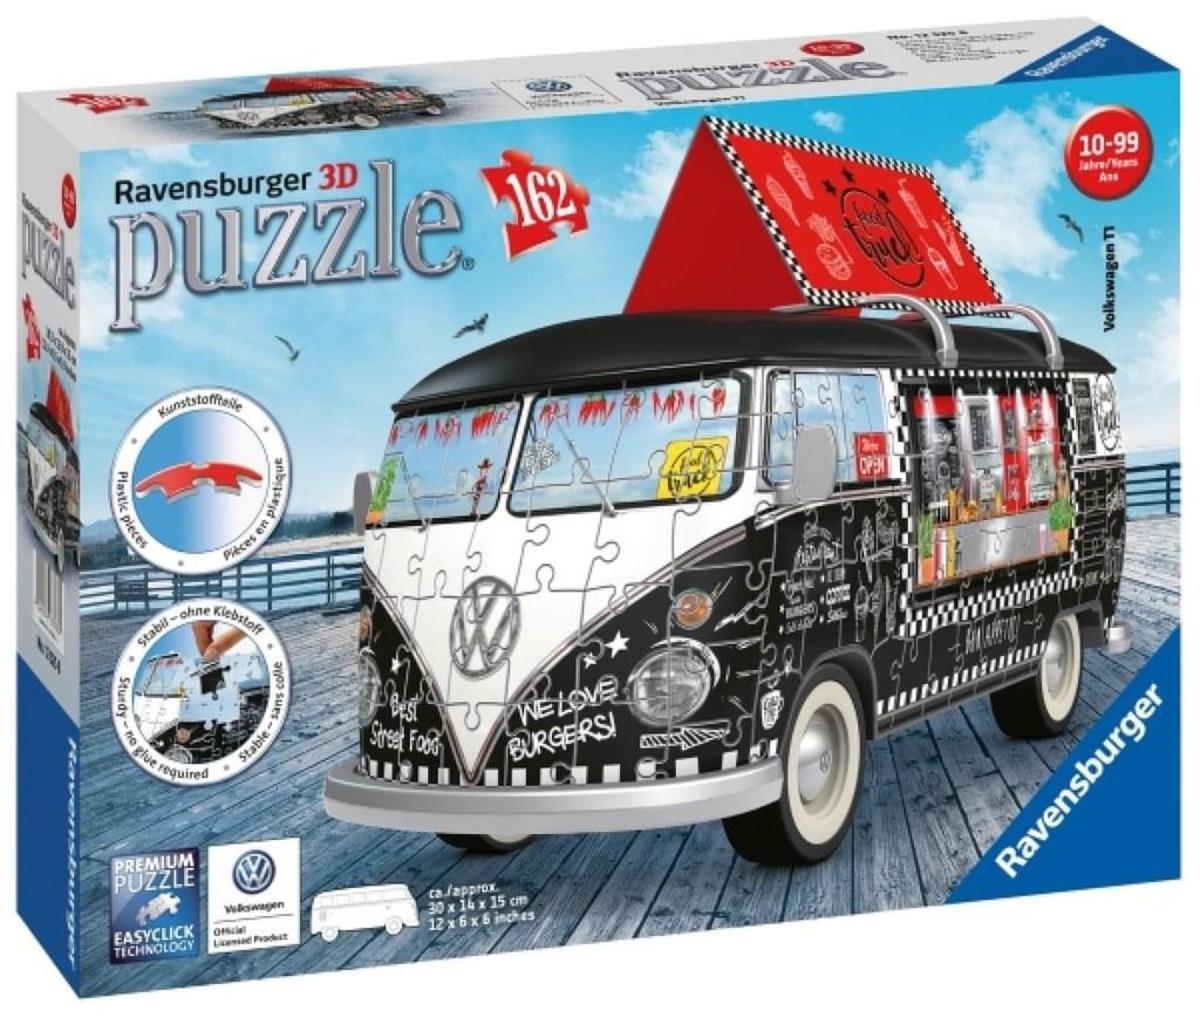 Bild 5 von Ravensburger 12525 VW T1 Food Truck,3D Puzzle